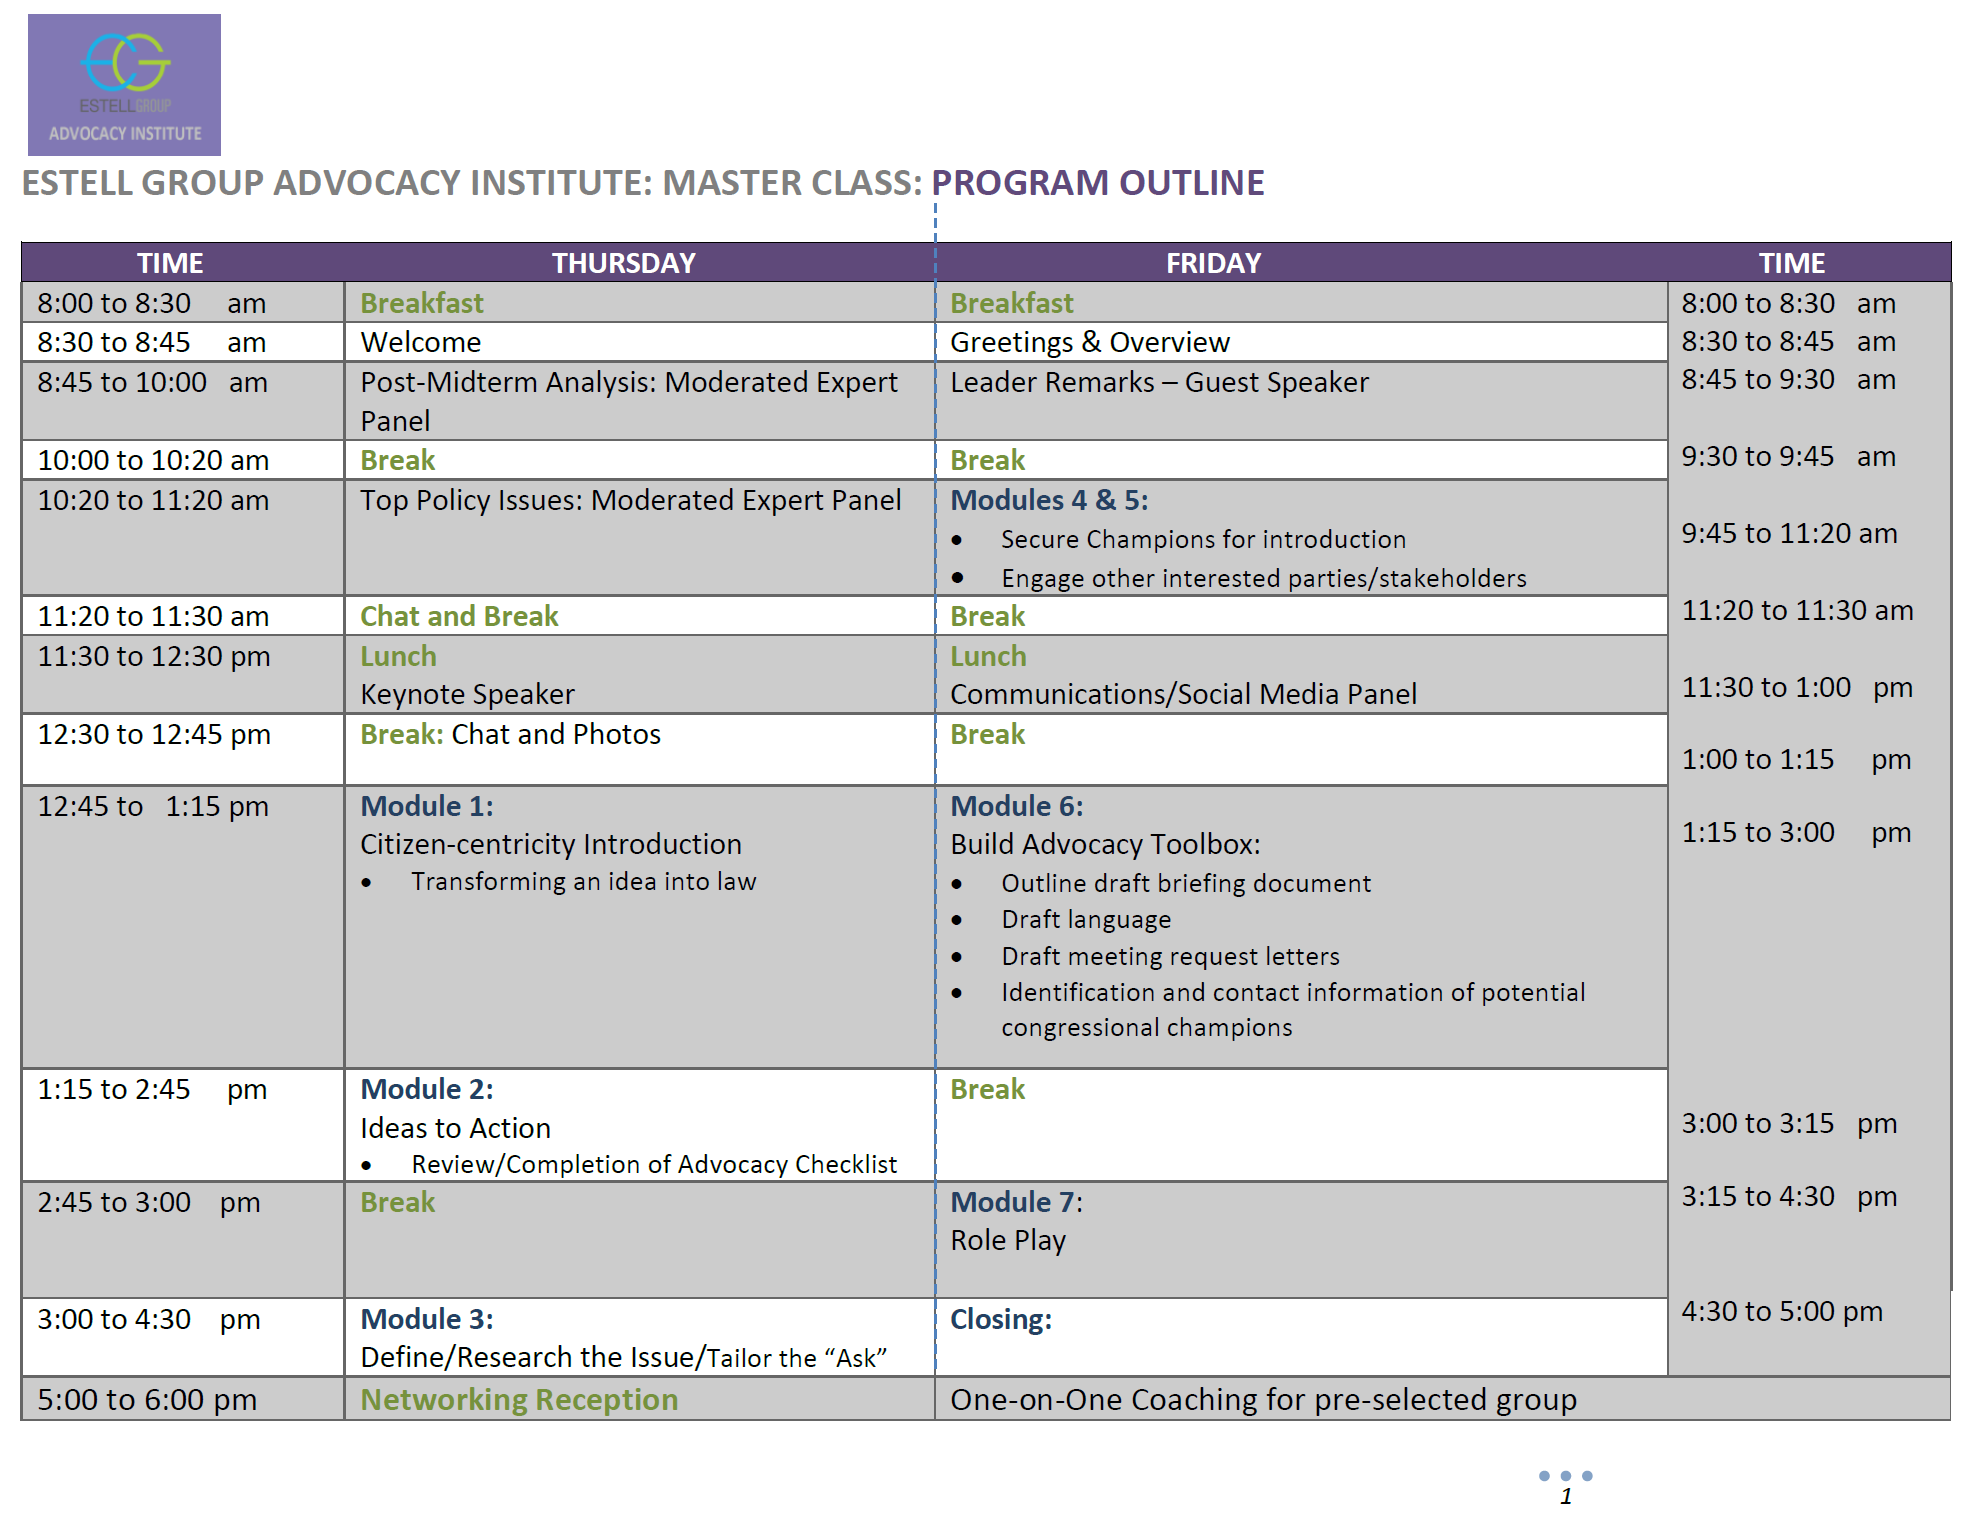 Advocacy Institute Program Outline